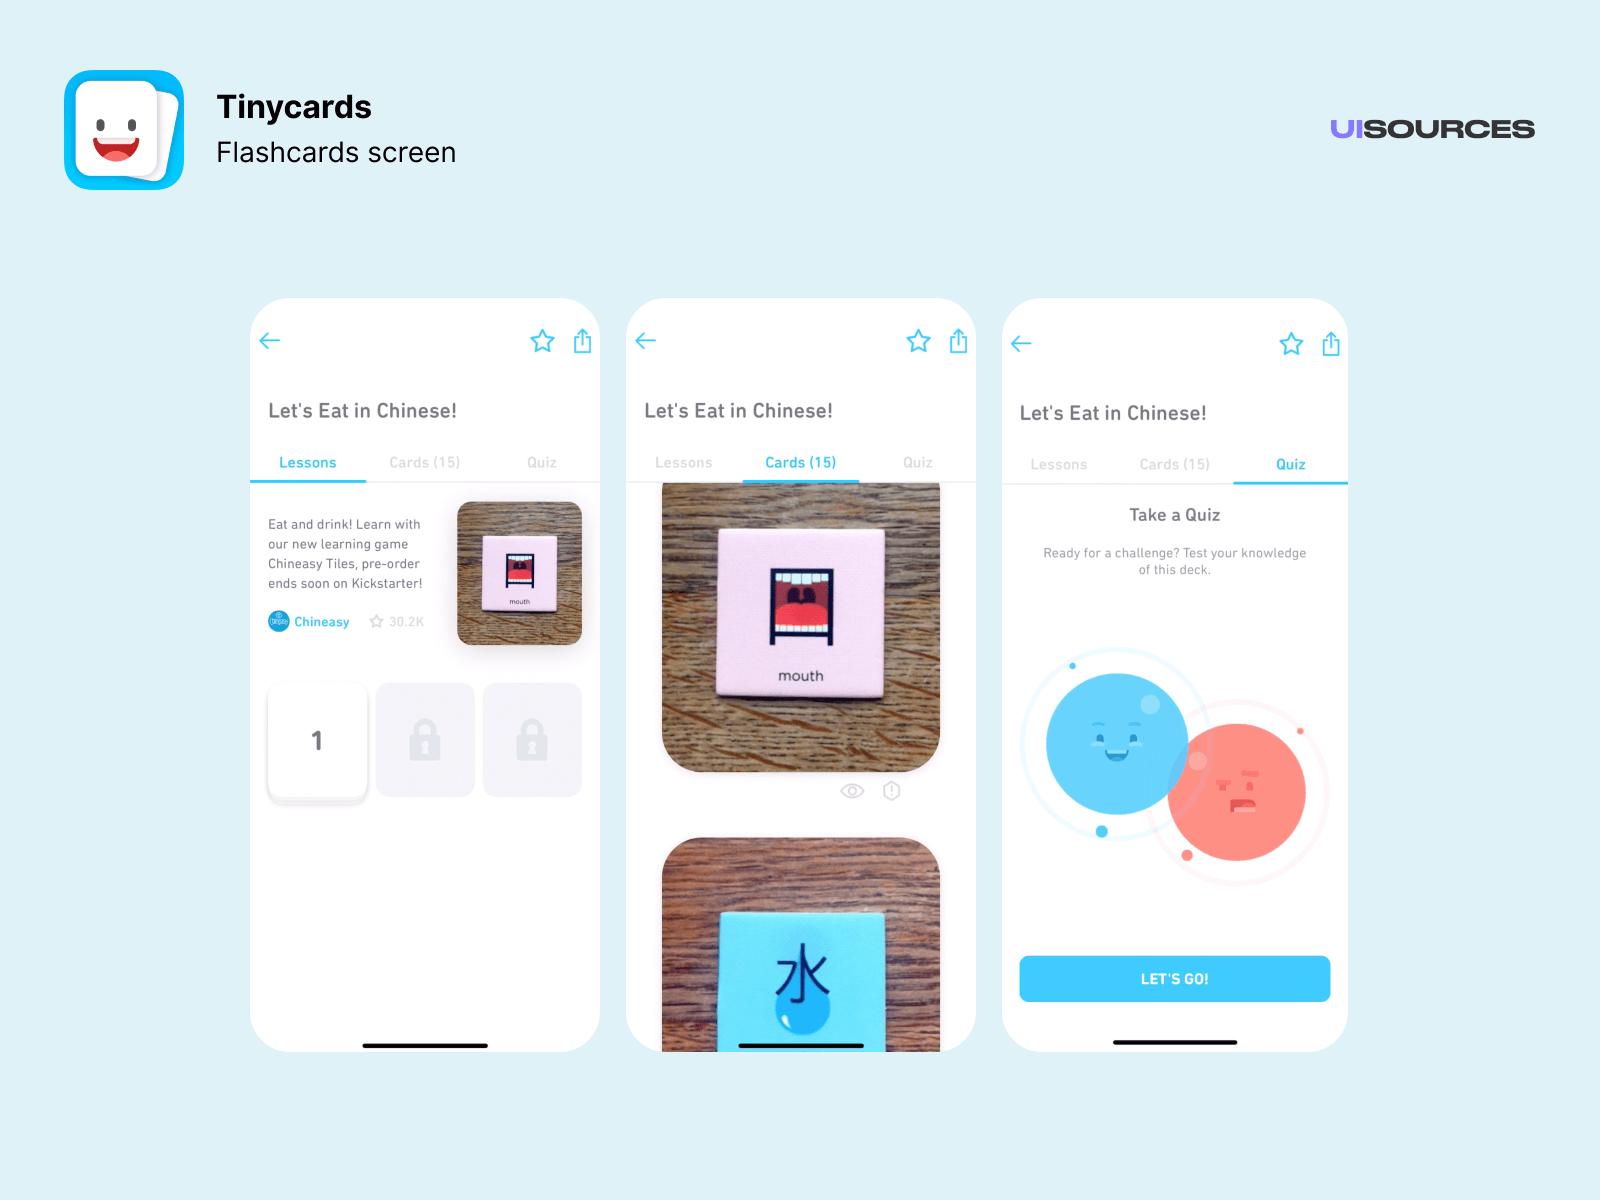 Flashcards screen